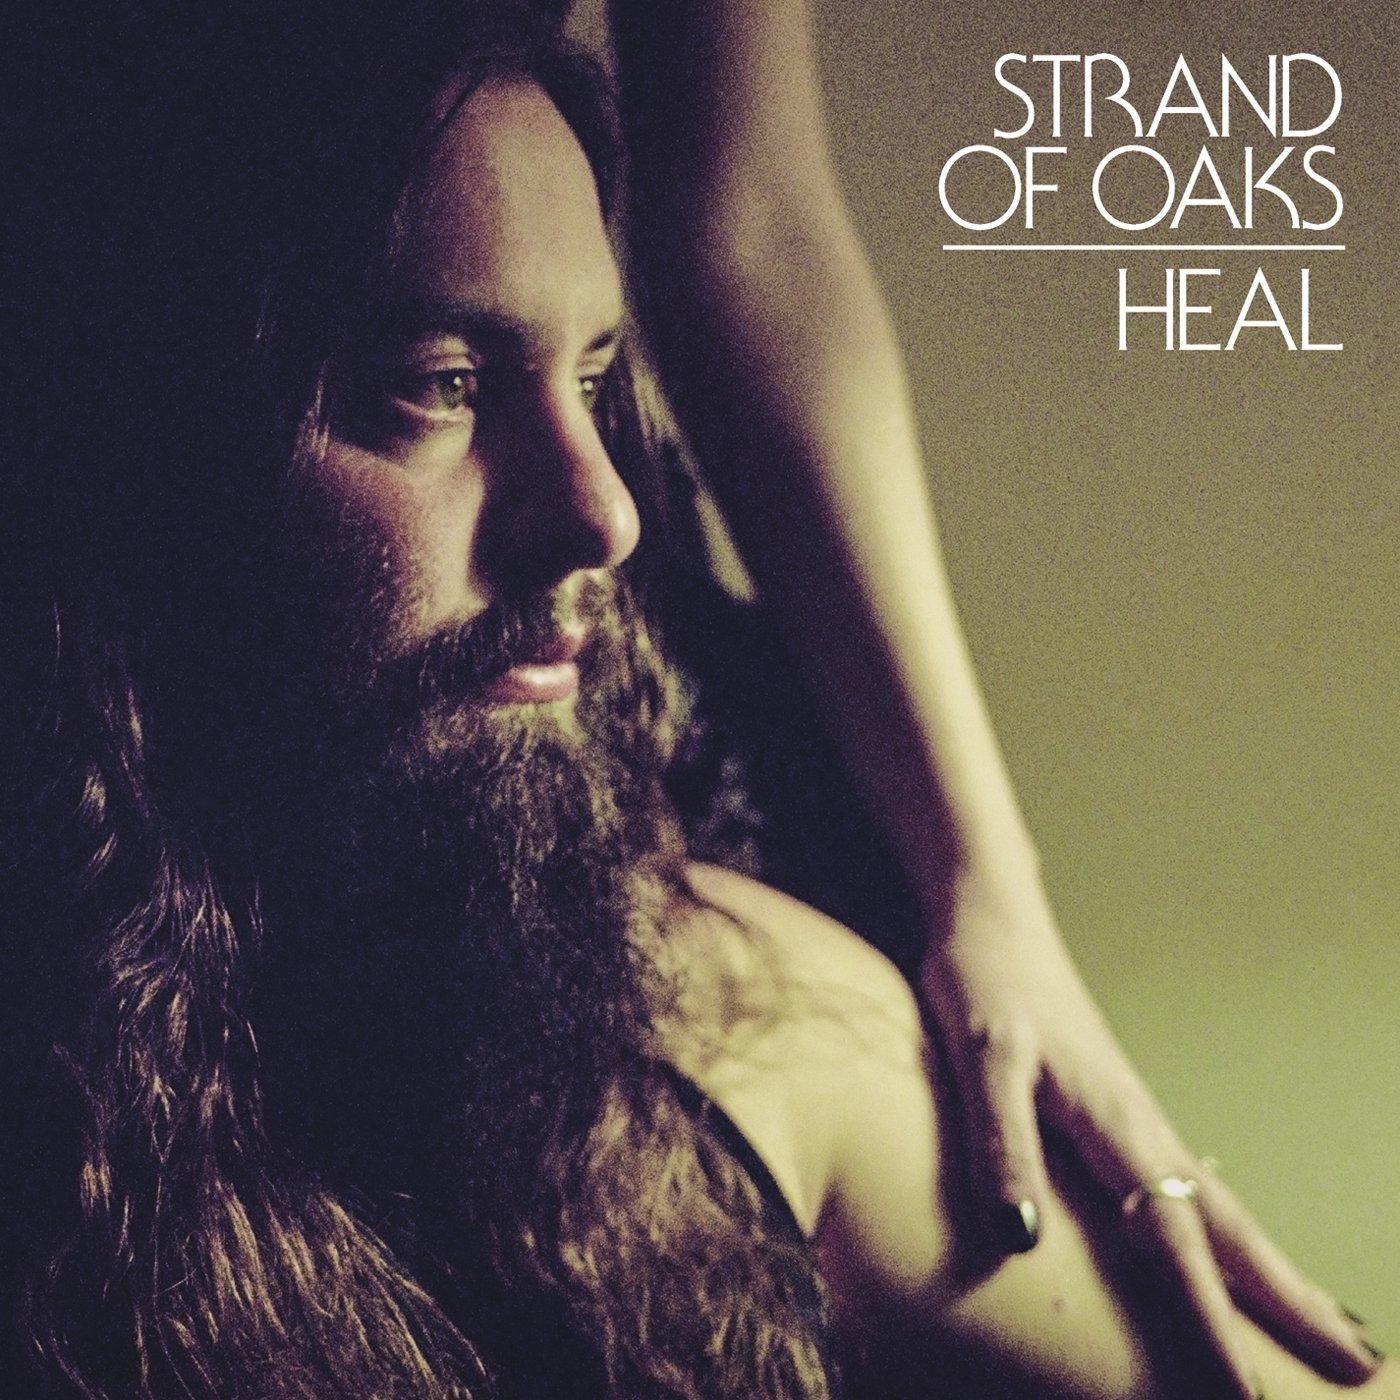 Strand of Oaks Timothy Showalter Timothy Showalter - Heal - Amazoncom  Music